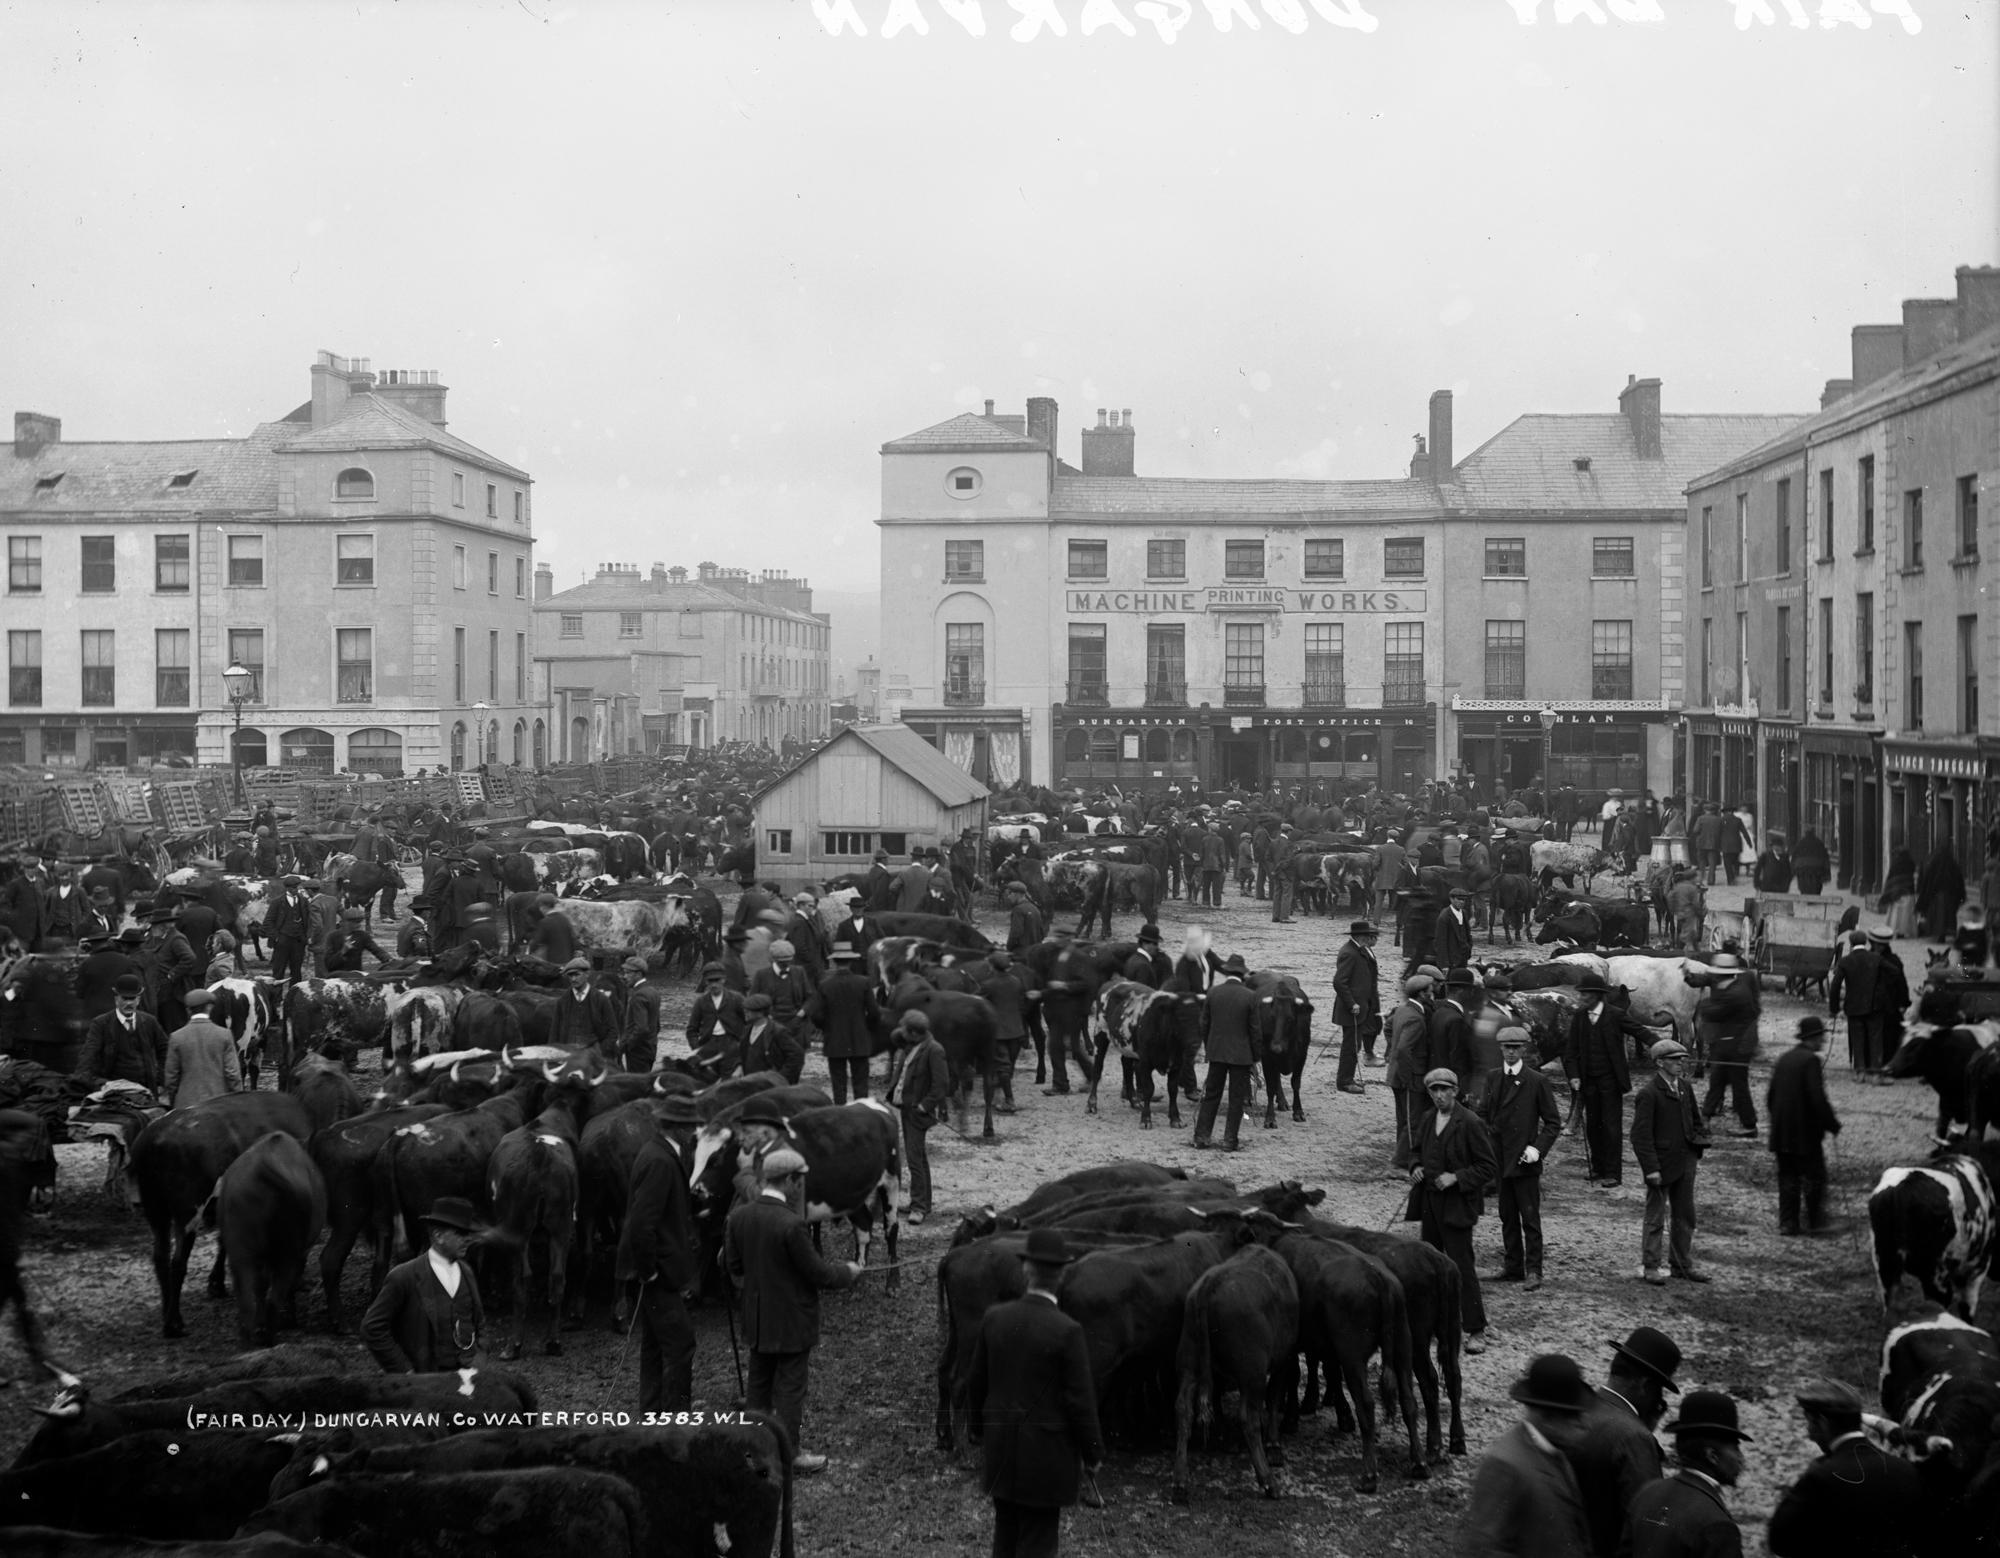 Fair Day, Dungarvan, Co. Waterford